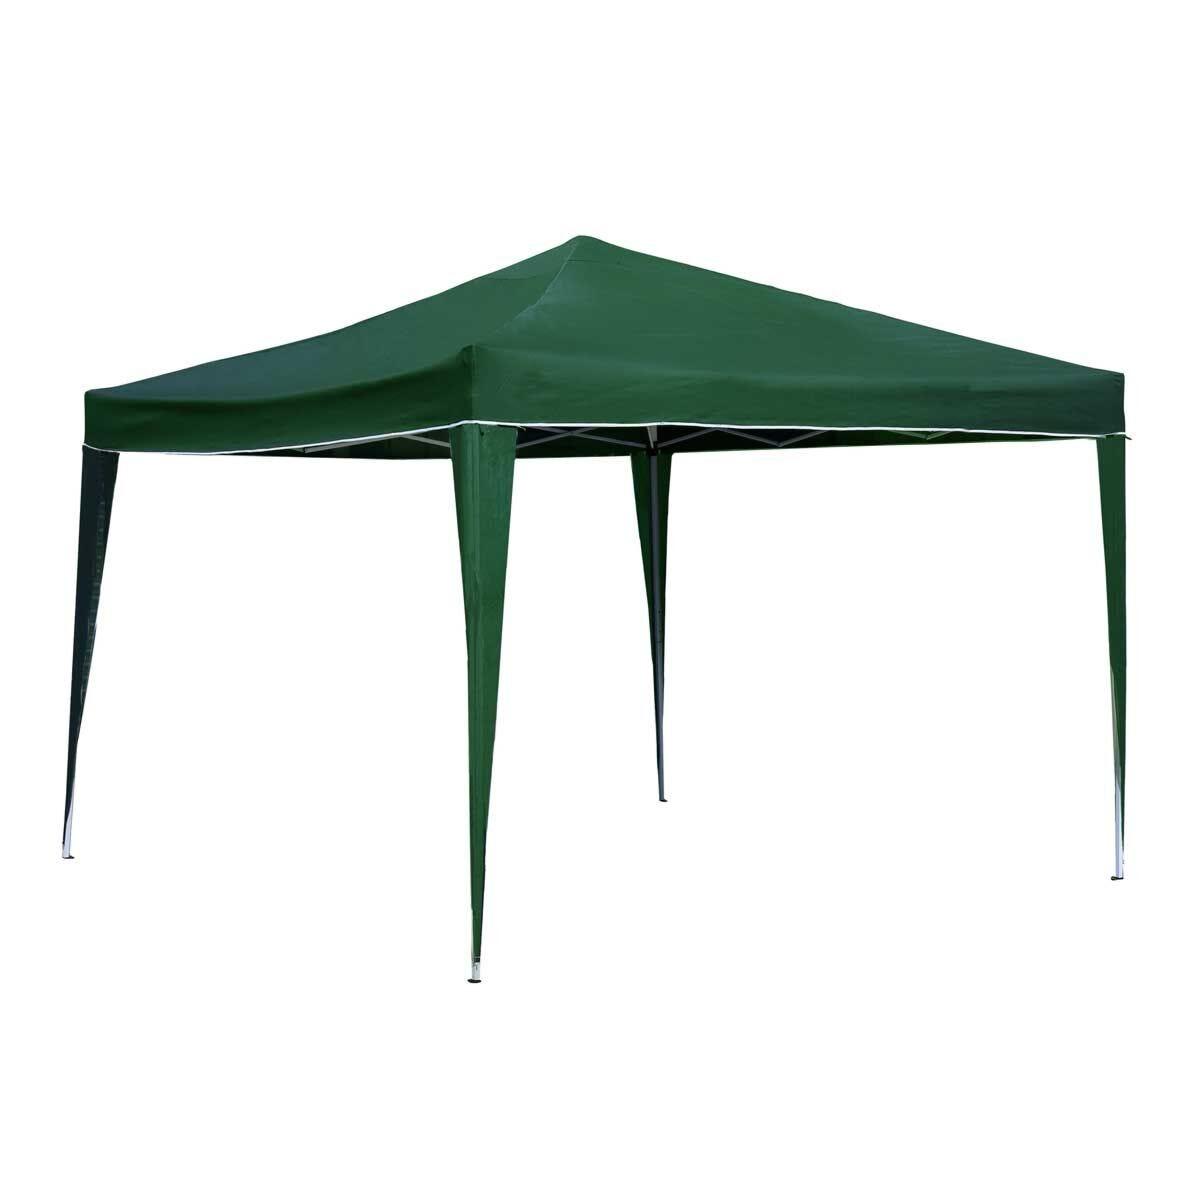 Charles Bentley 3m x 3m Foldable Gazebo Green